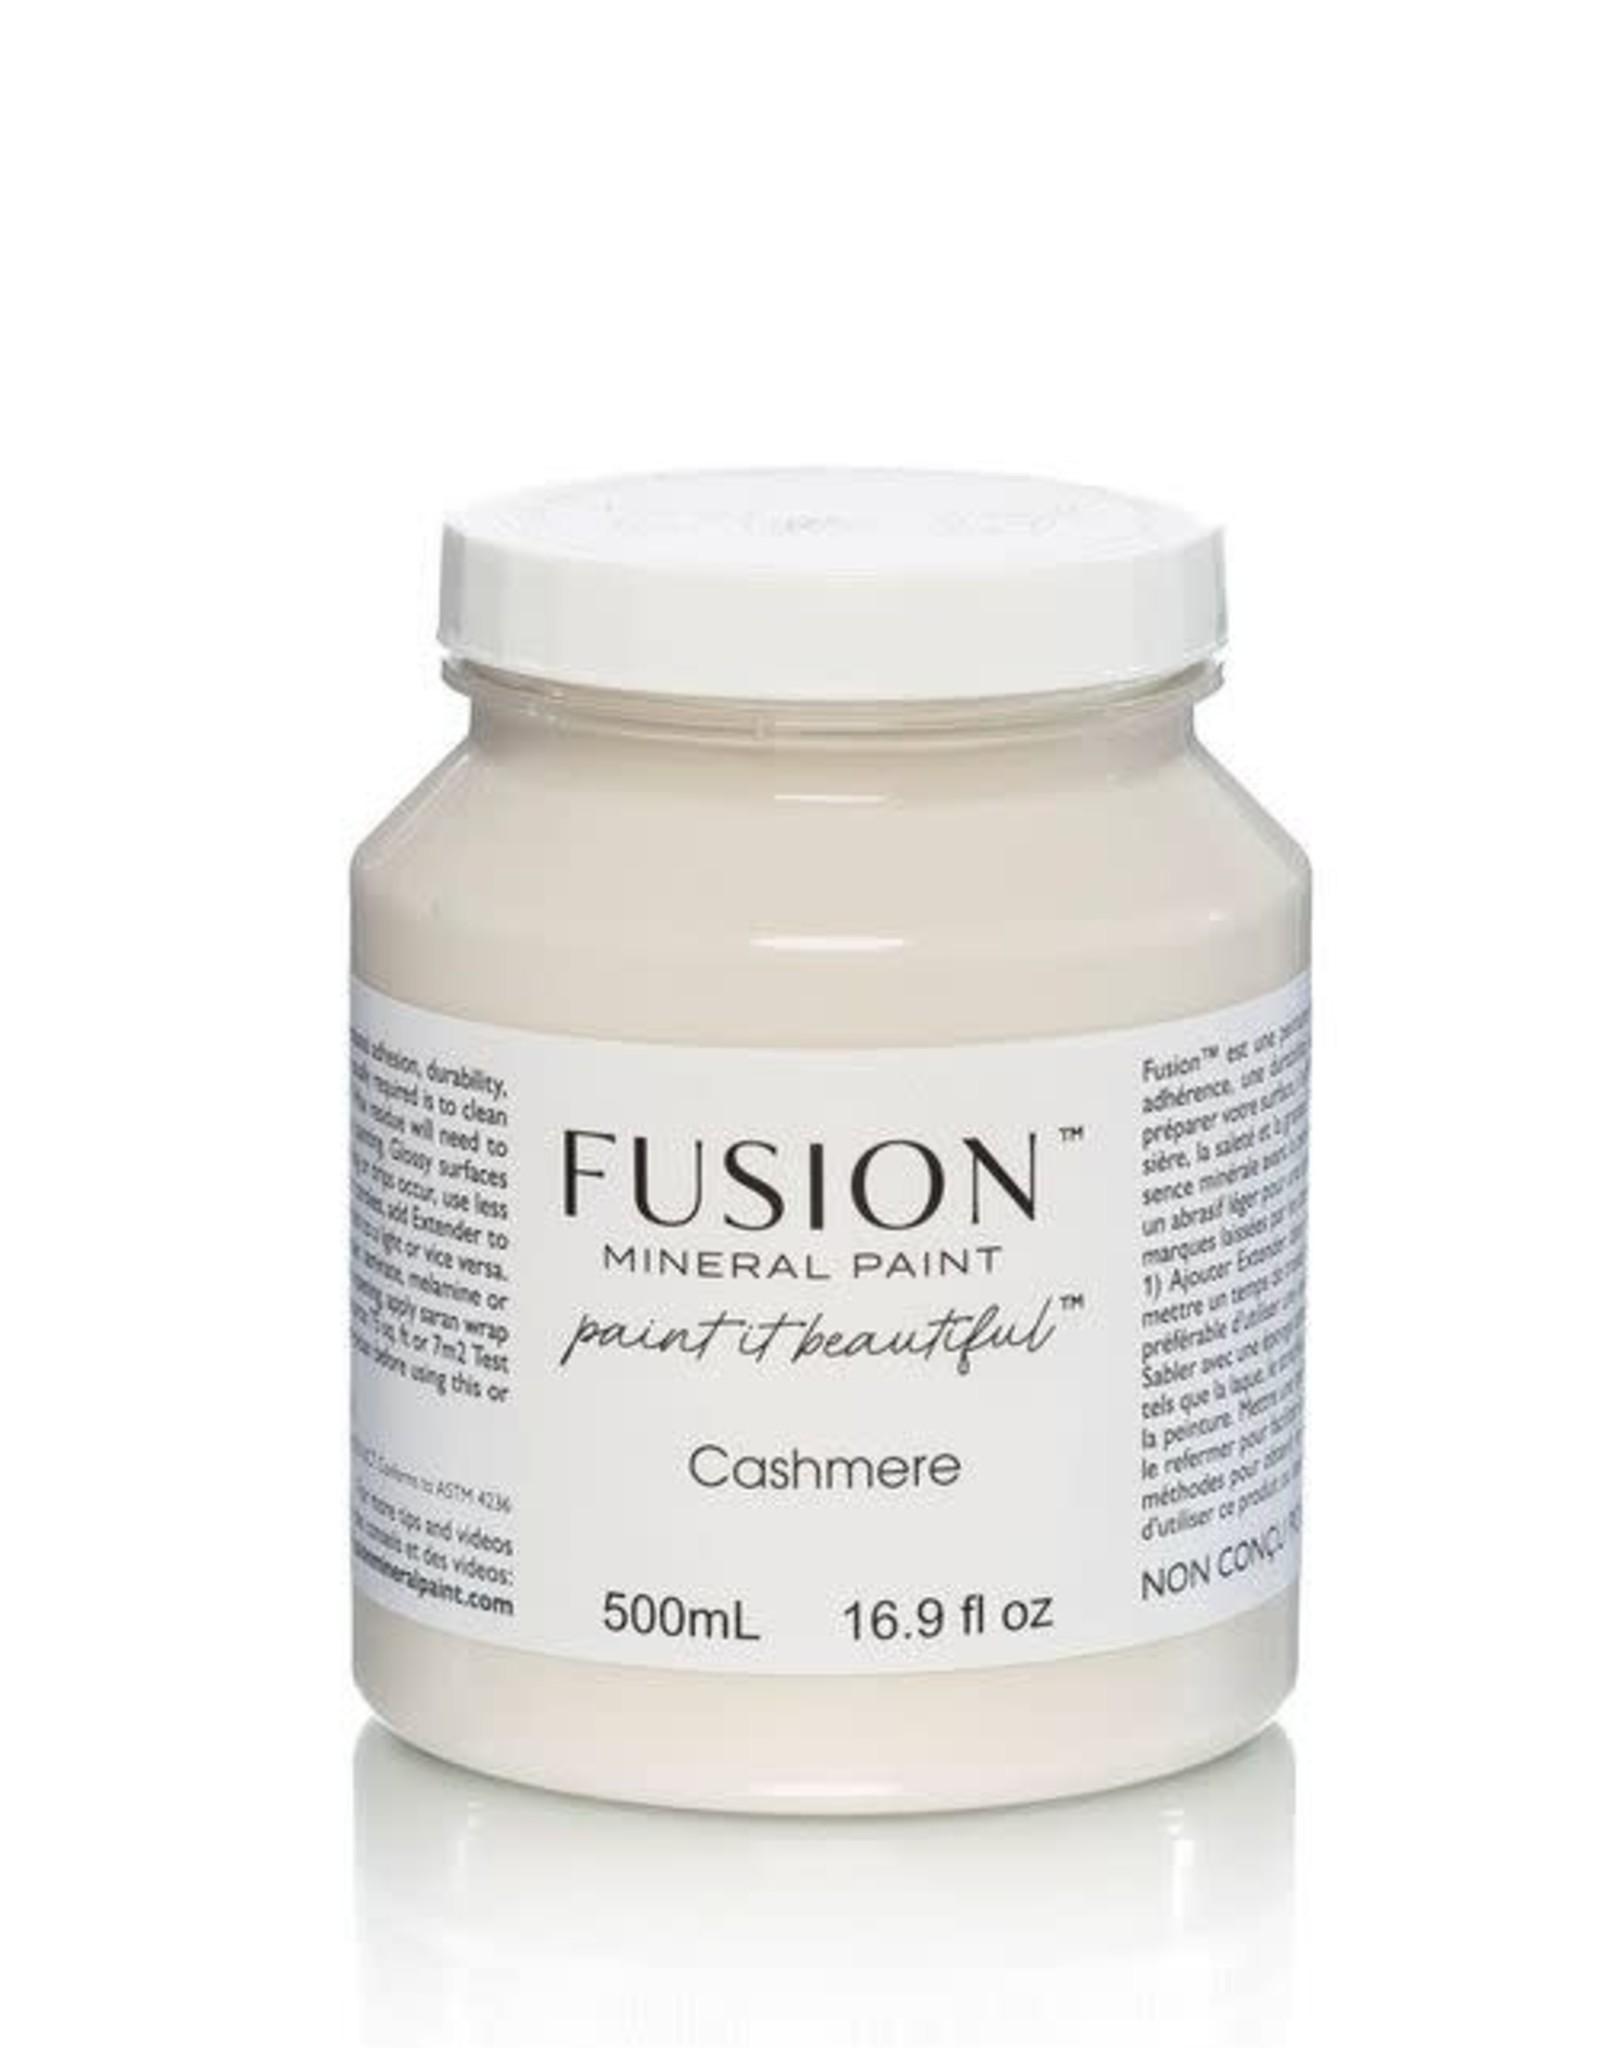 Fusion Mineral Paint Fusion Mineral Paint - Cashmere 500ml